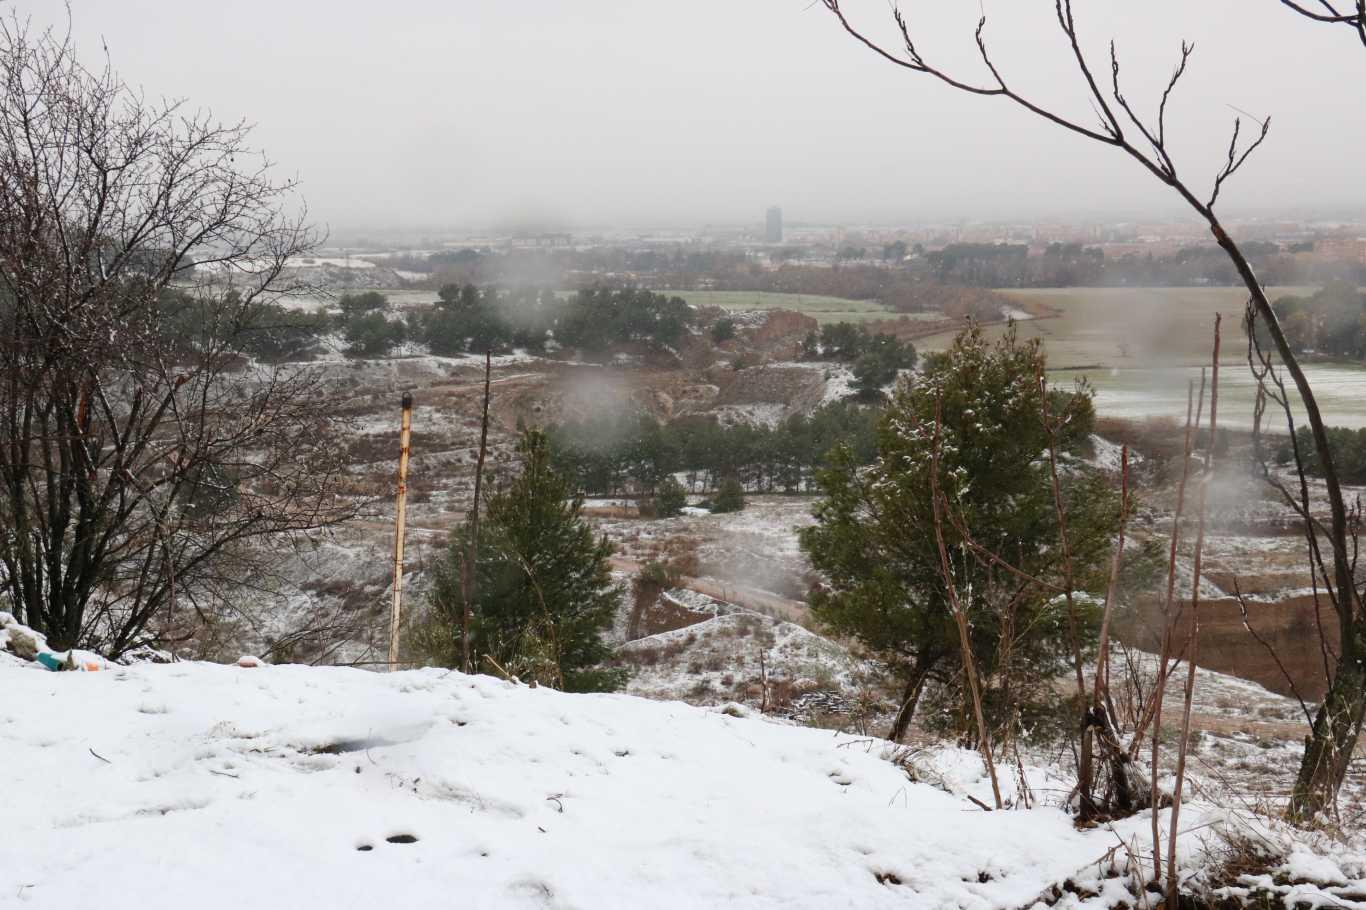 Nieve en alcal de henares nos vamos al zulema dream for Cementerio jardin de alcala de henares